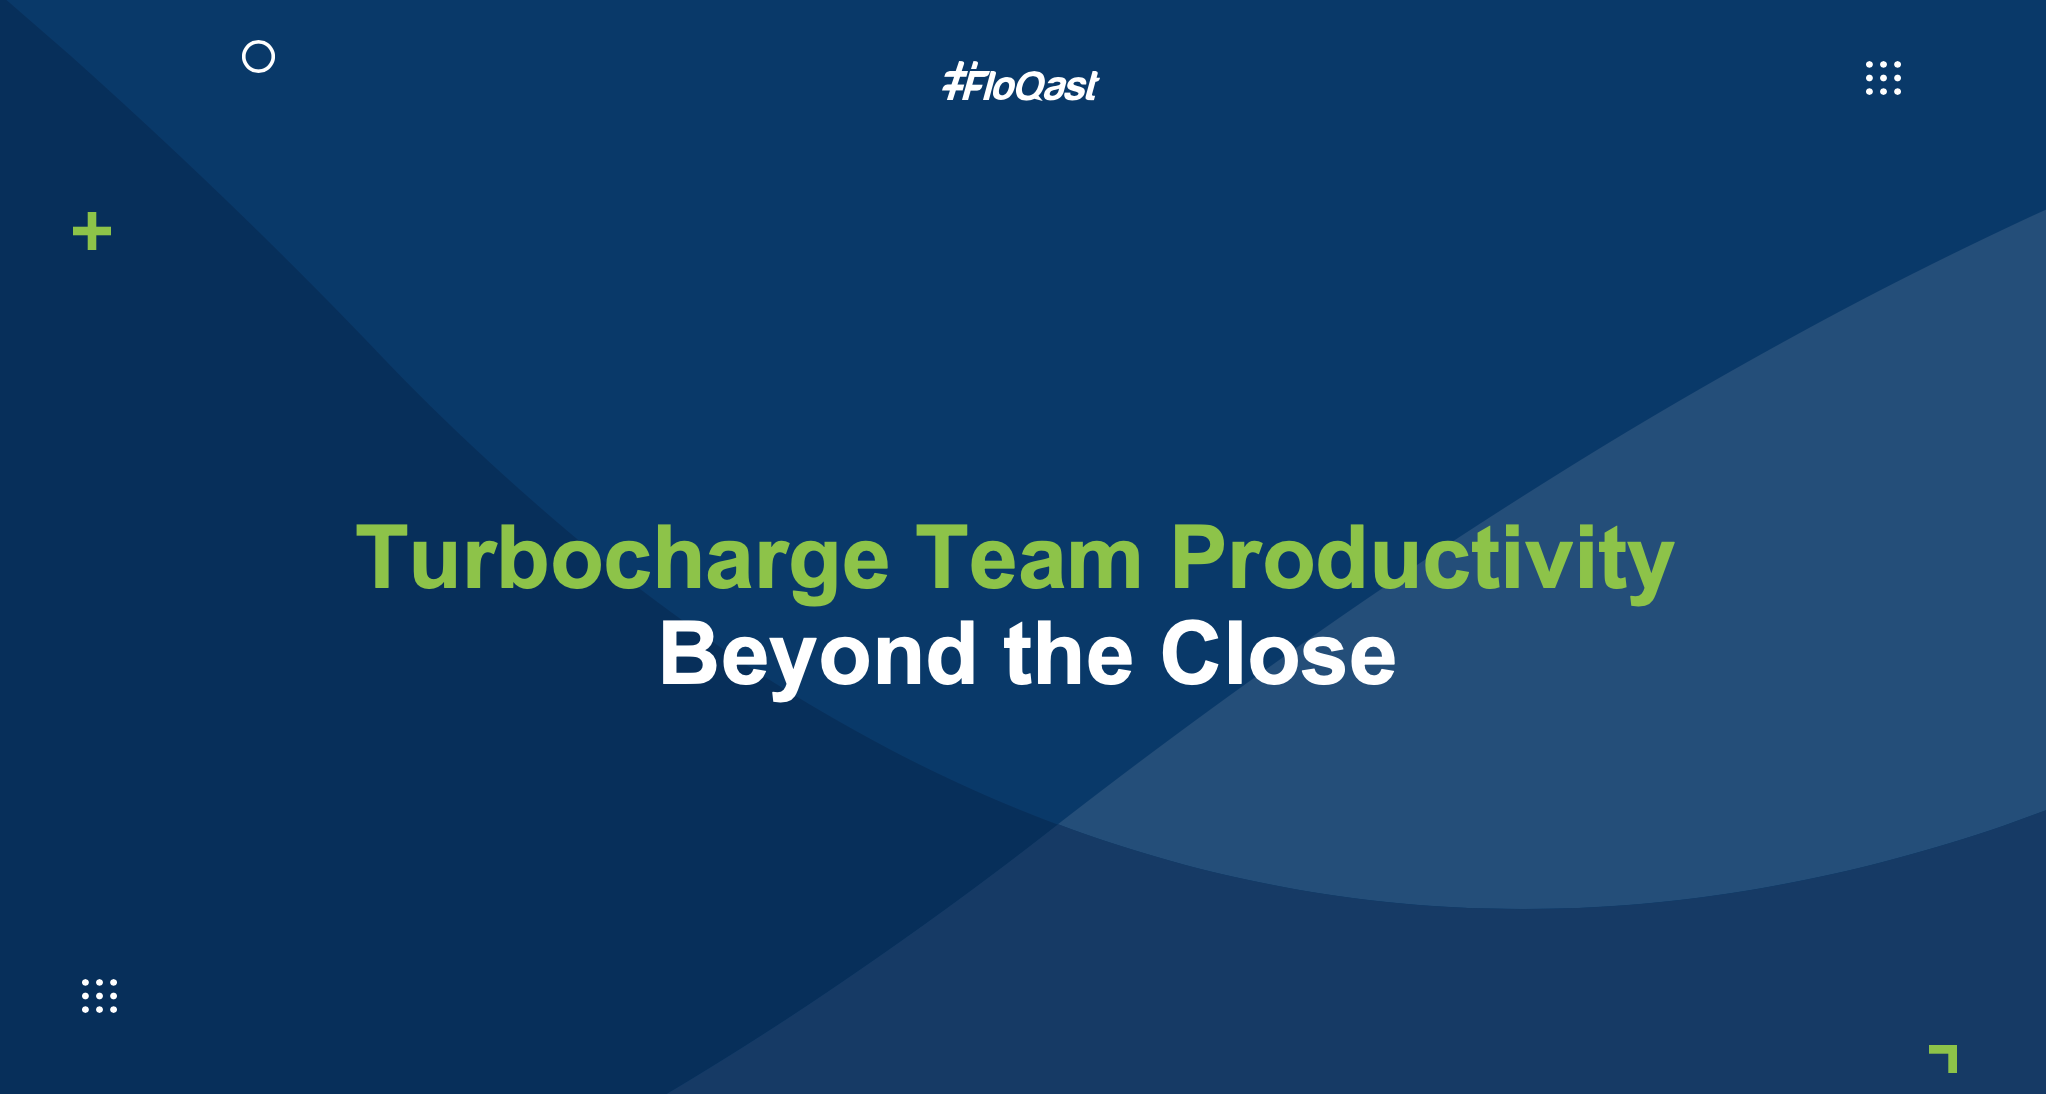 Turbocharge Team Productivity